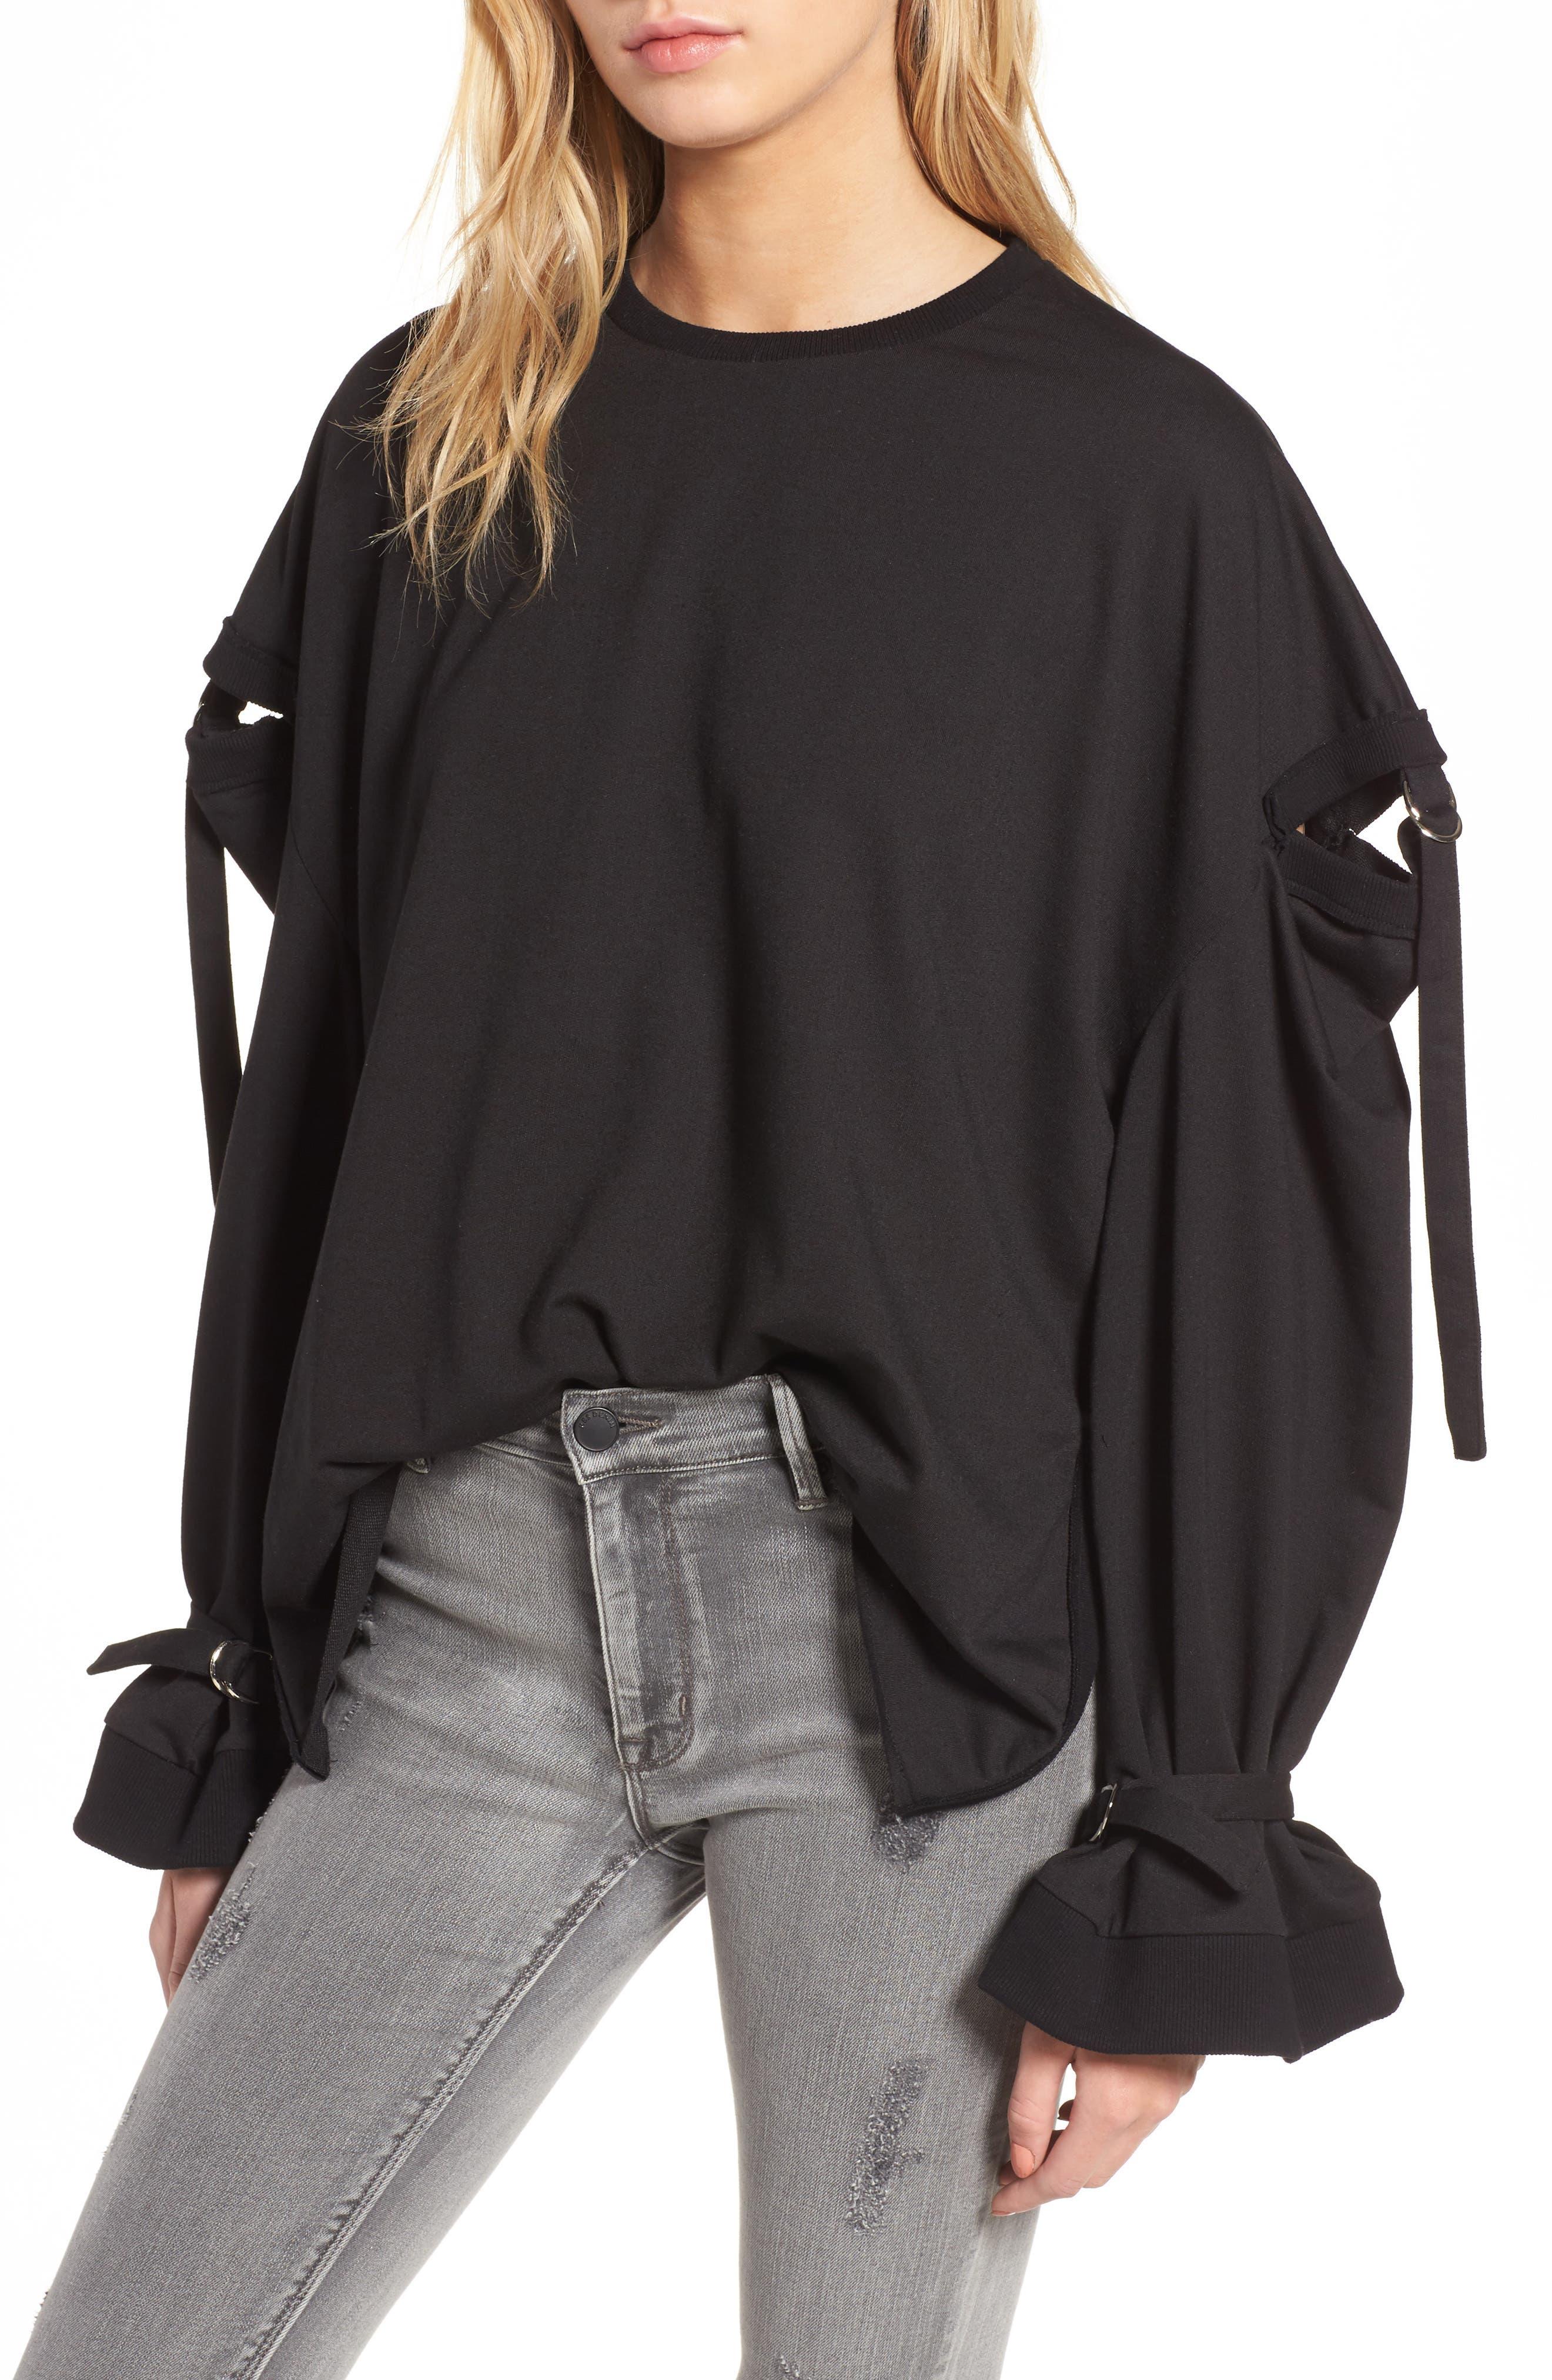 J.O.A. Cutout Detail Sweatshirt